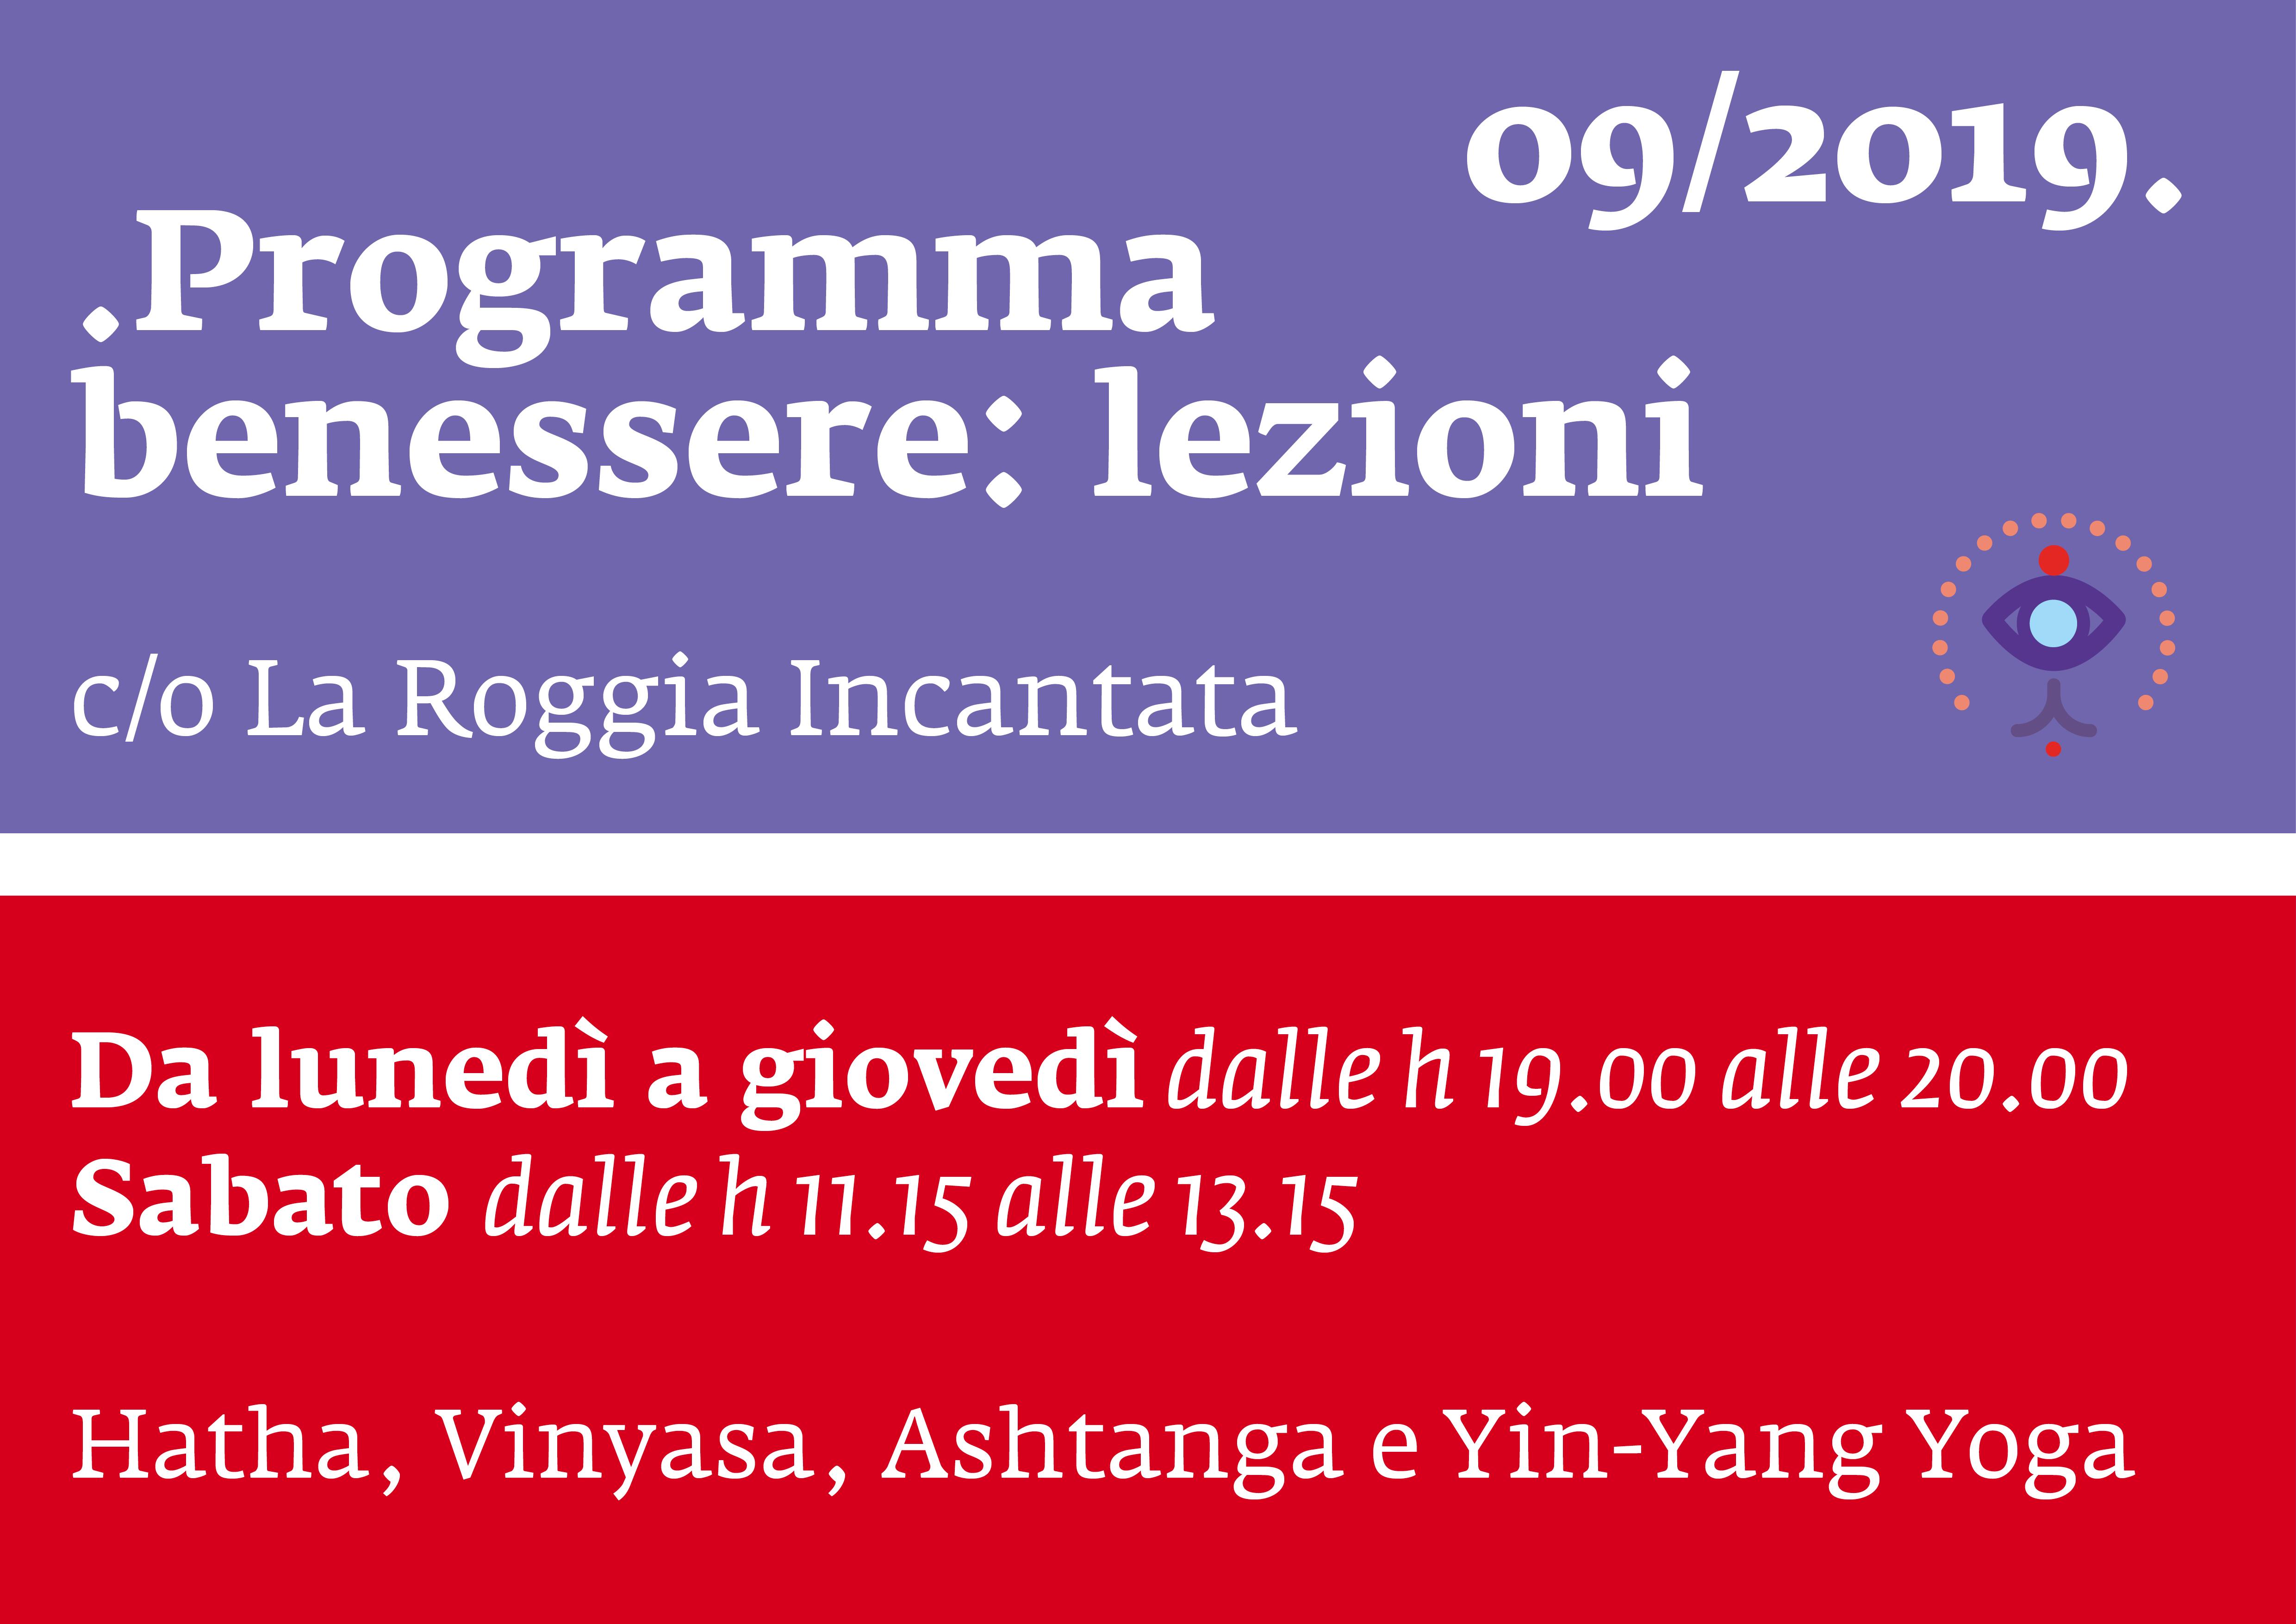 Calendario Anno 2015 Mensile.Calendario Mensile Cascina Martesana